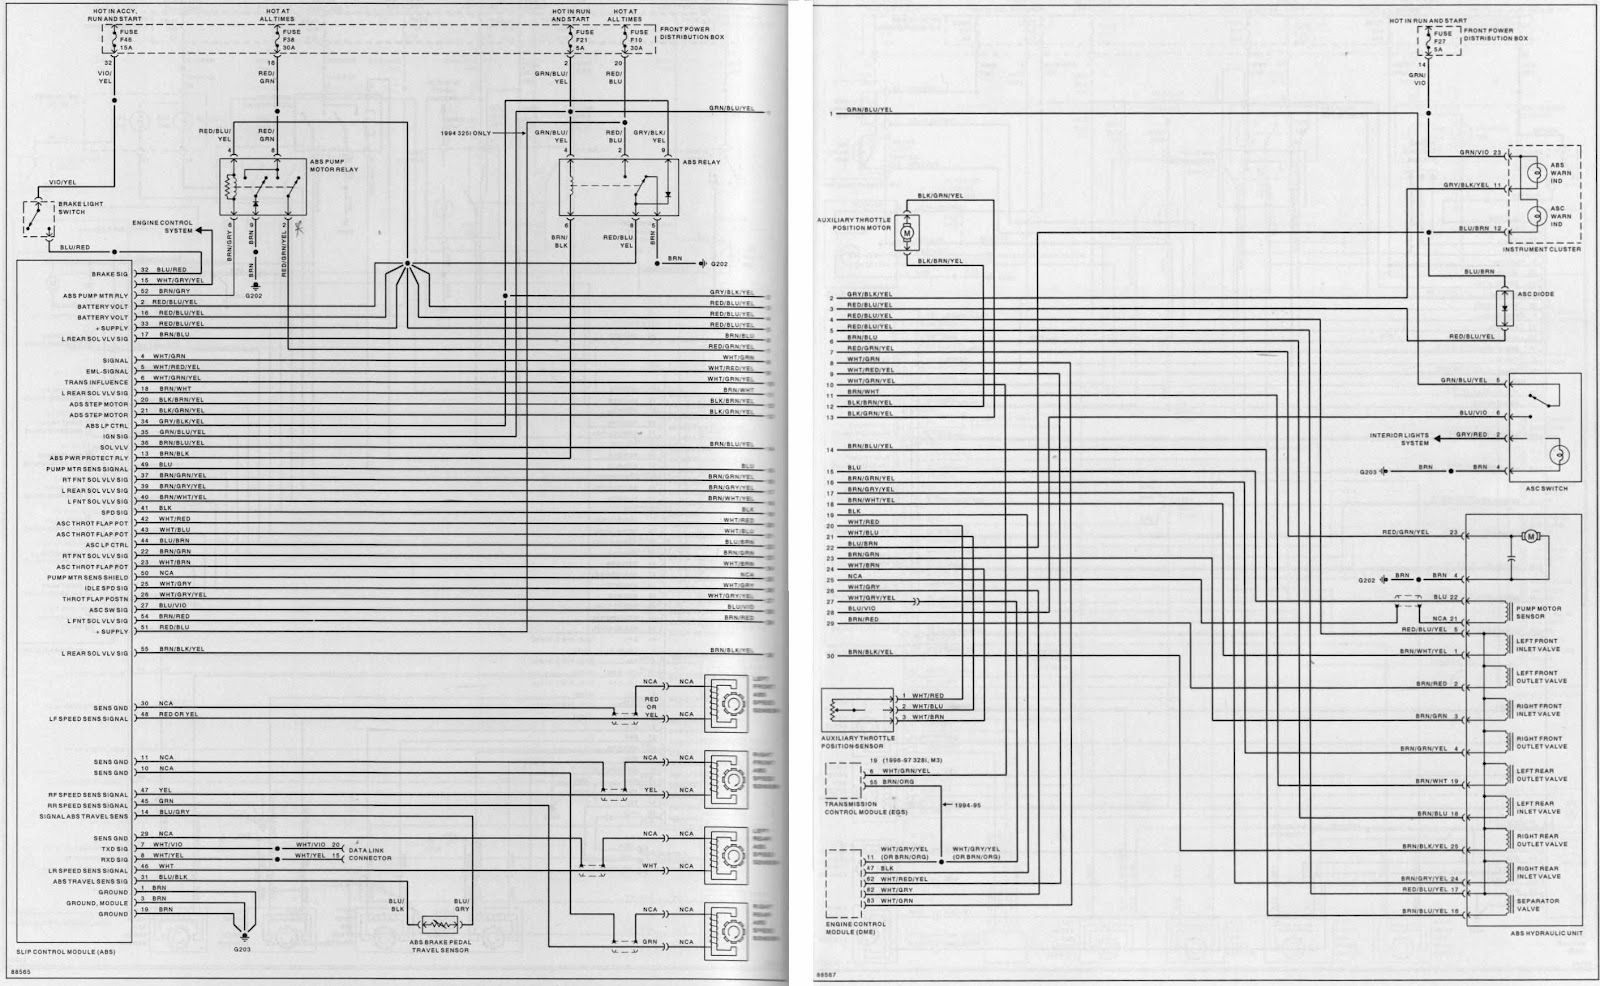 bmw s1000rr wiring diagram wiring diagrams u2022 rh co biz co